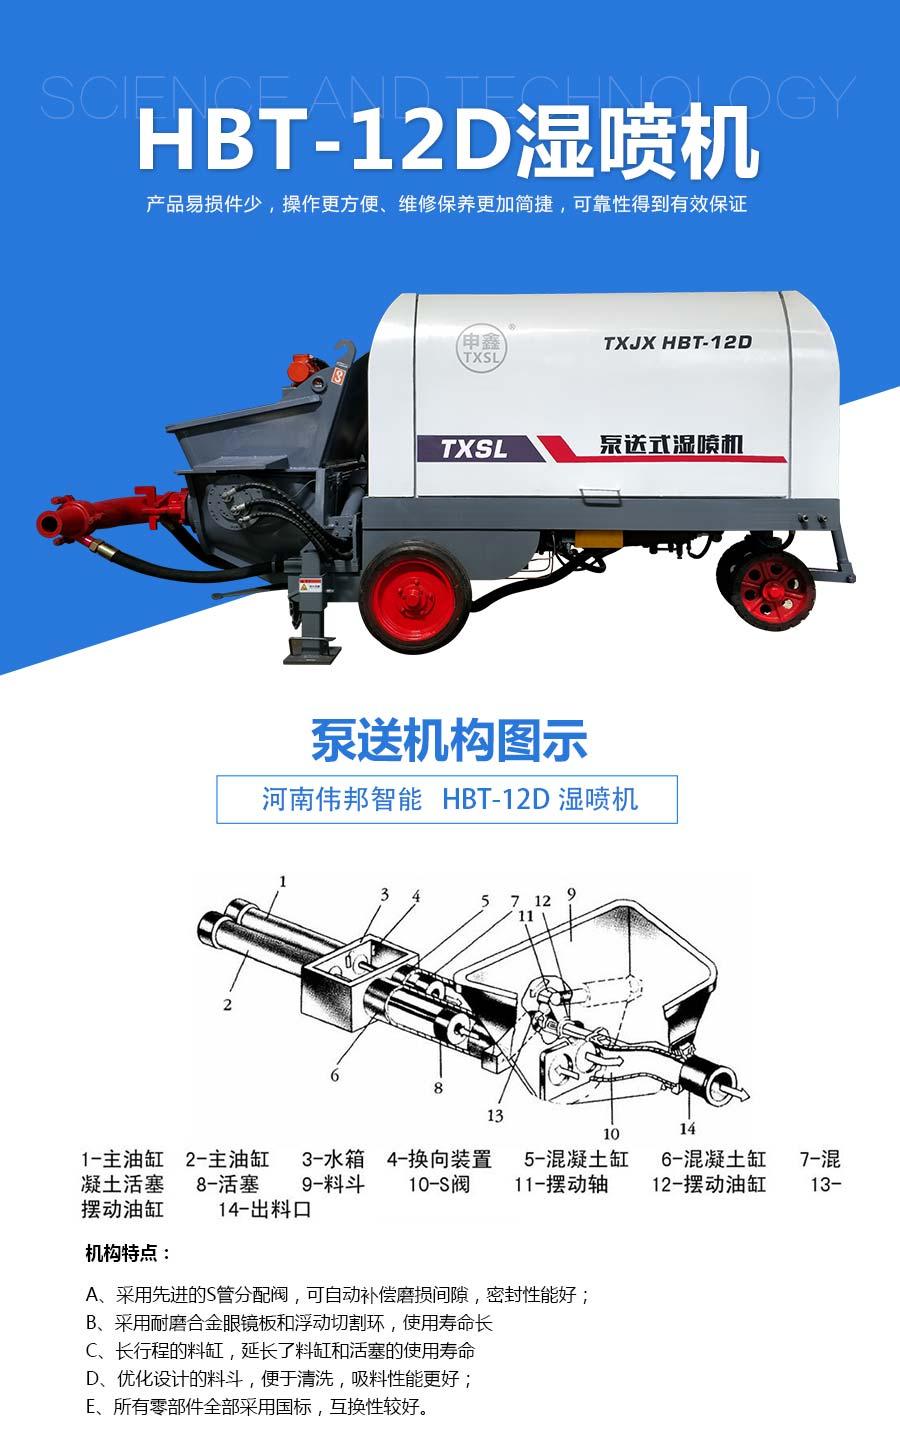 HBT-12D-湿喷机白色新_01